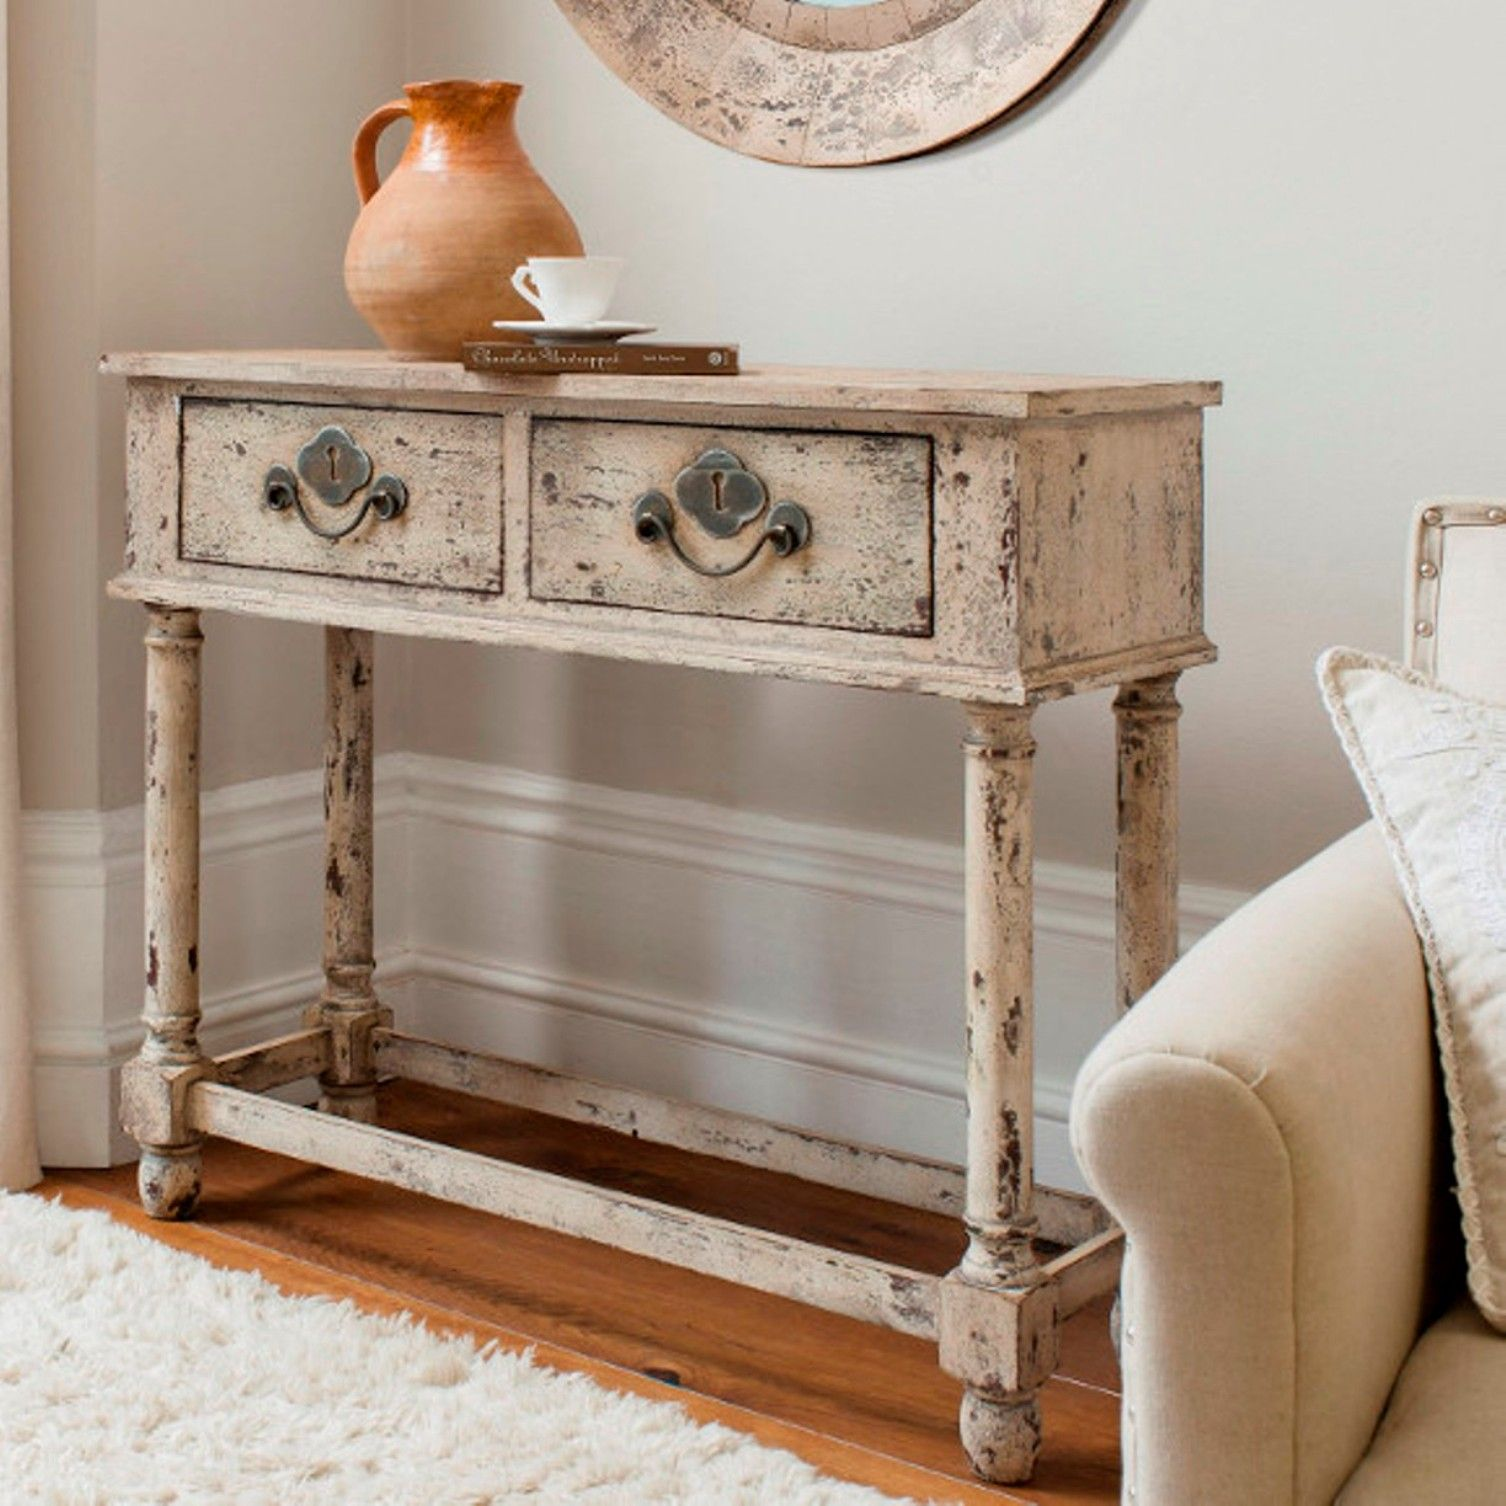 Furniture , Distressed Furniture Design Ideas : End Table Distressed Furniture For Living Room With Drawers